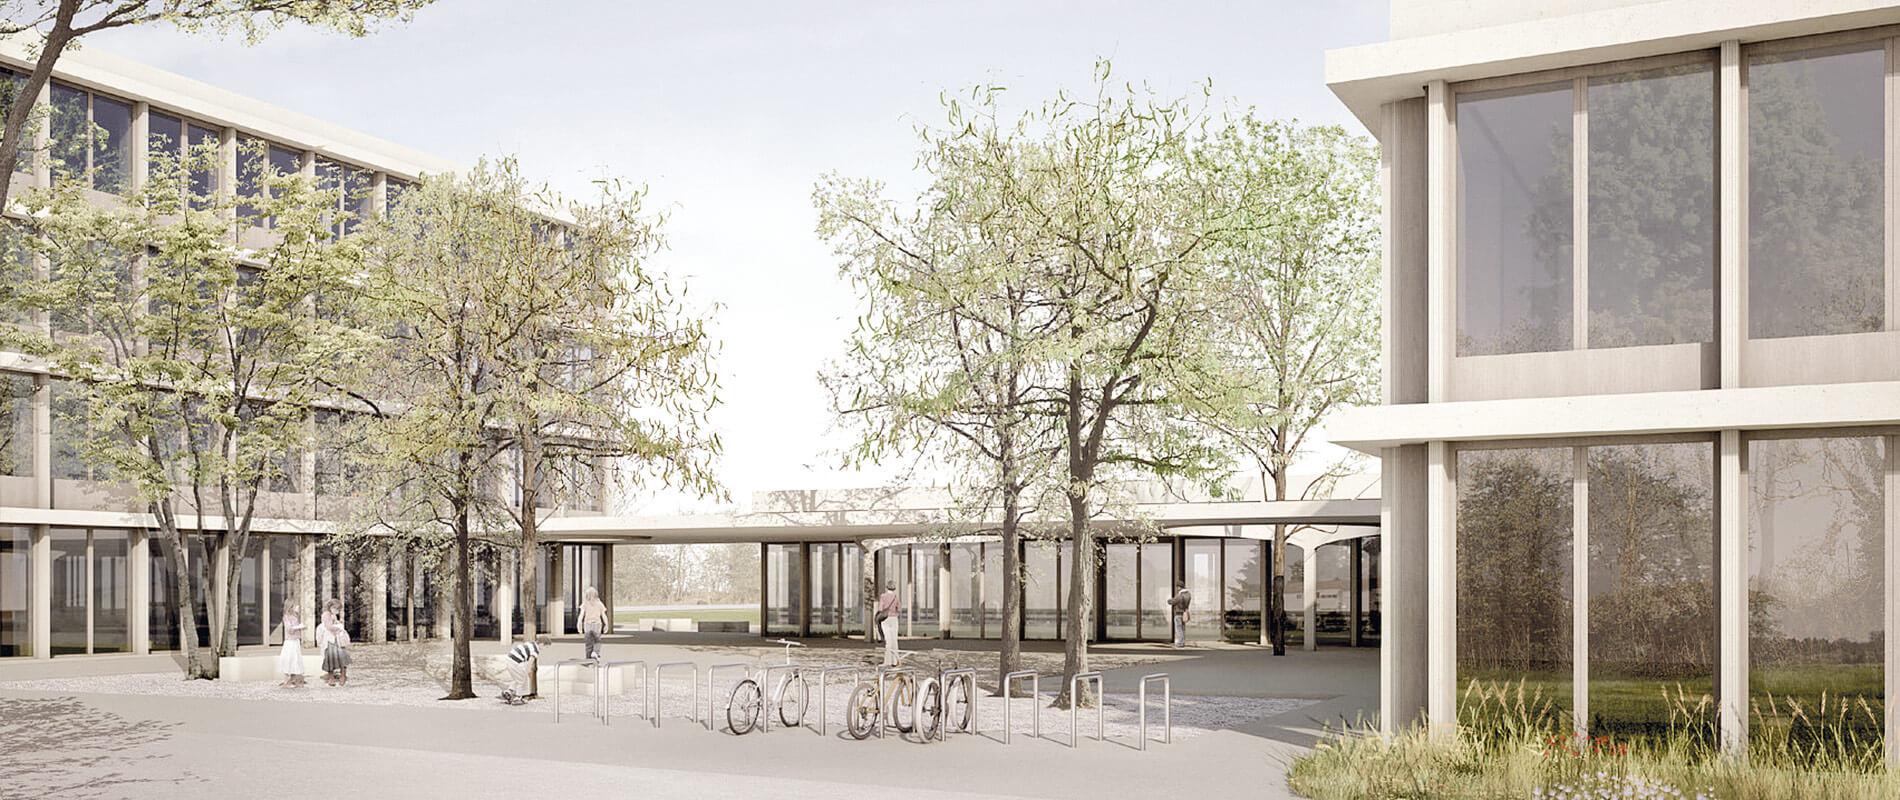 Schulhaus Dietlimoos |Adliswil | Referenz | Ettinger Partner